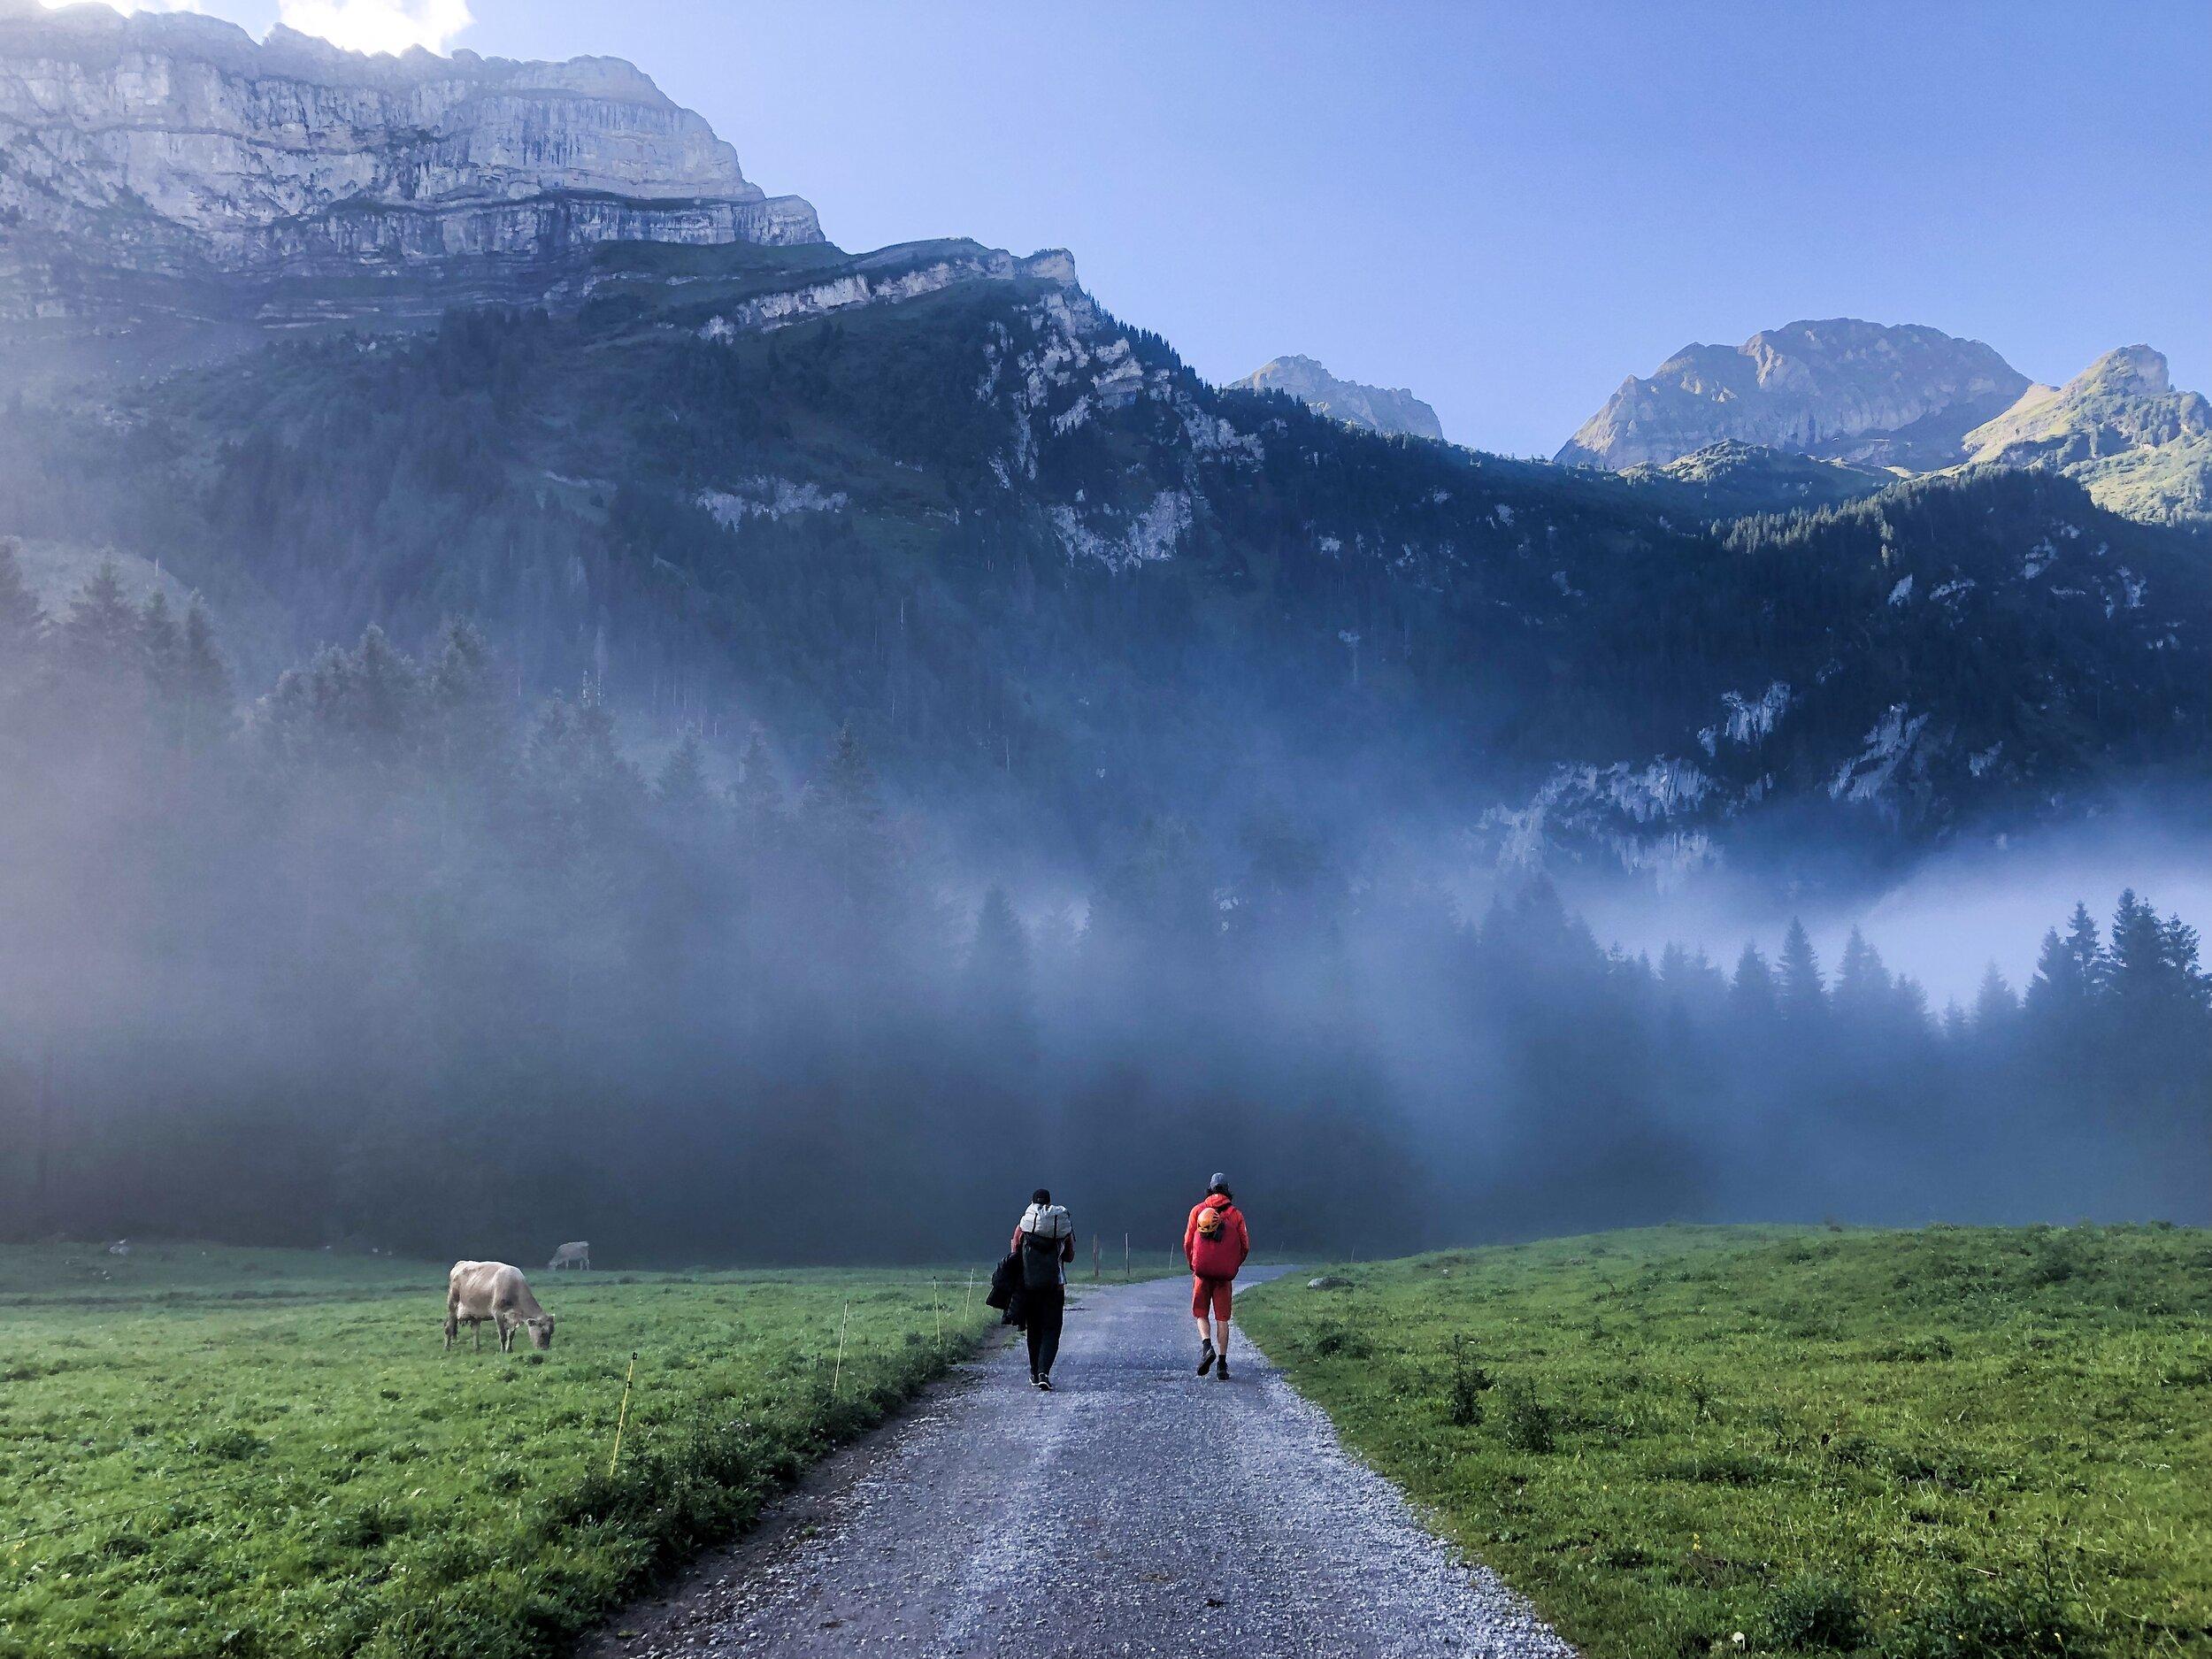 Sampsa and Lukas approaching in Voralpsee, Switzerland (2019)